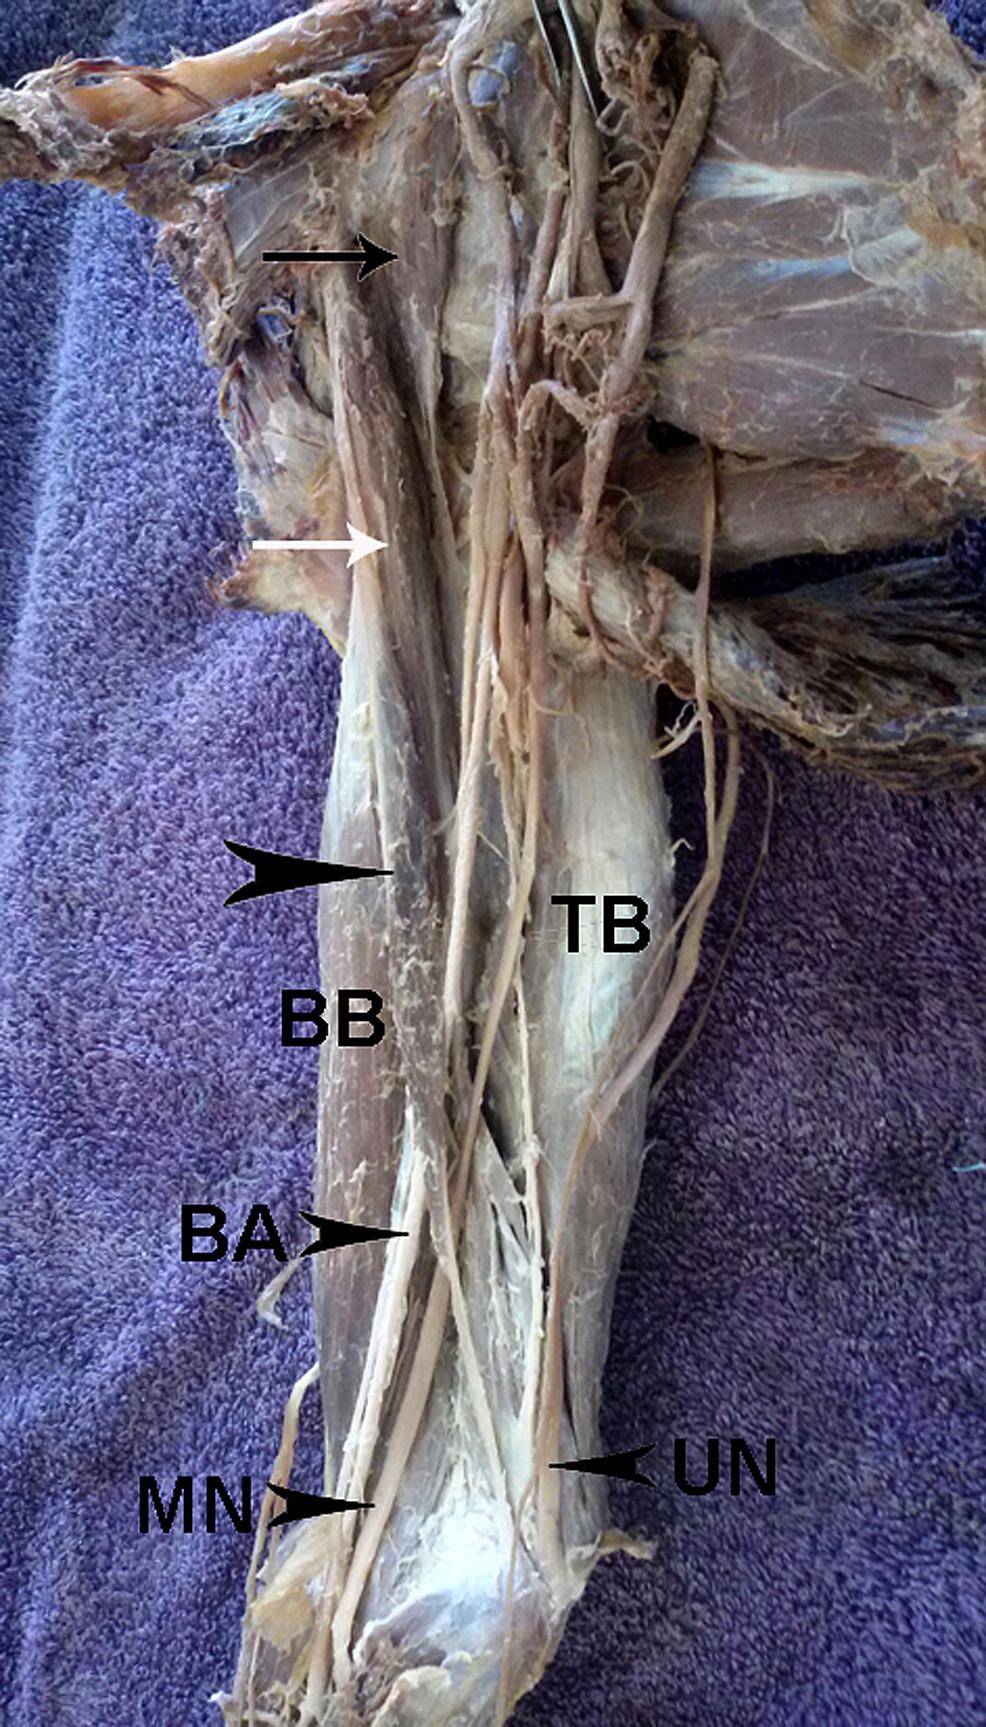 Photograph-of-the-right-brachium